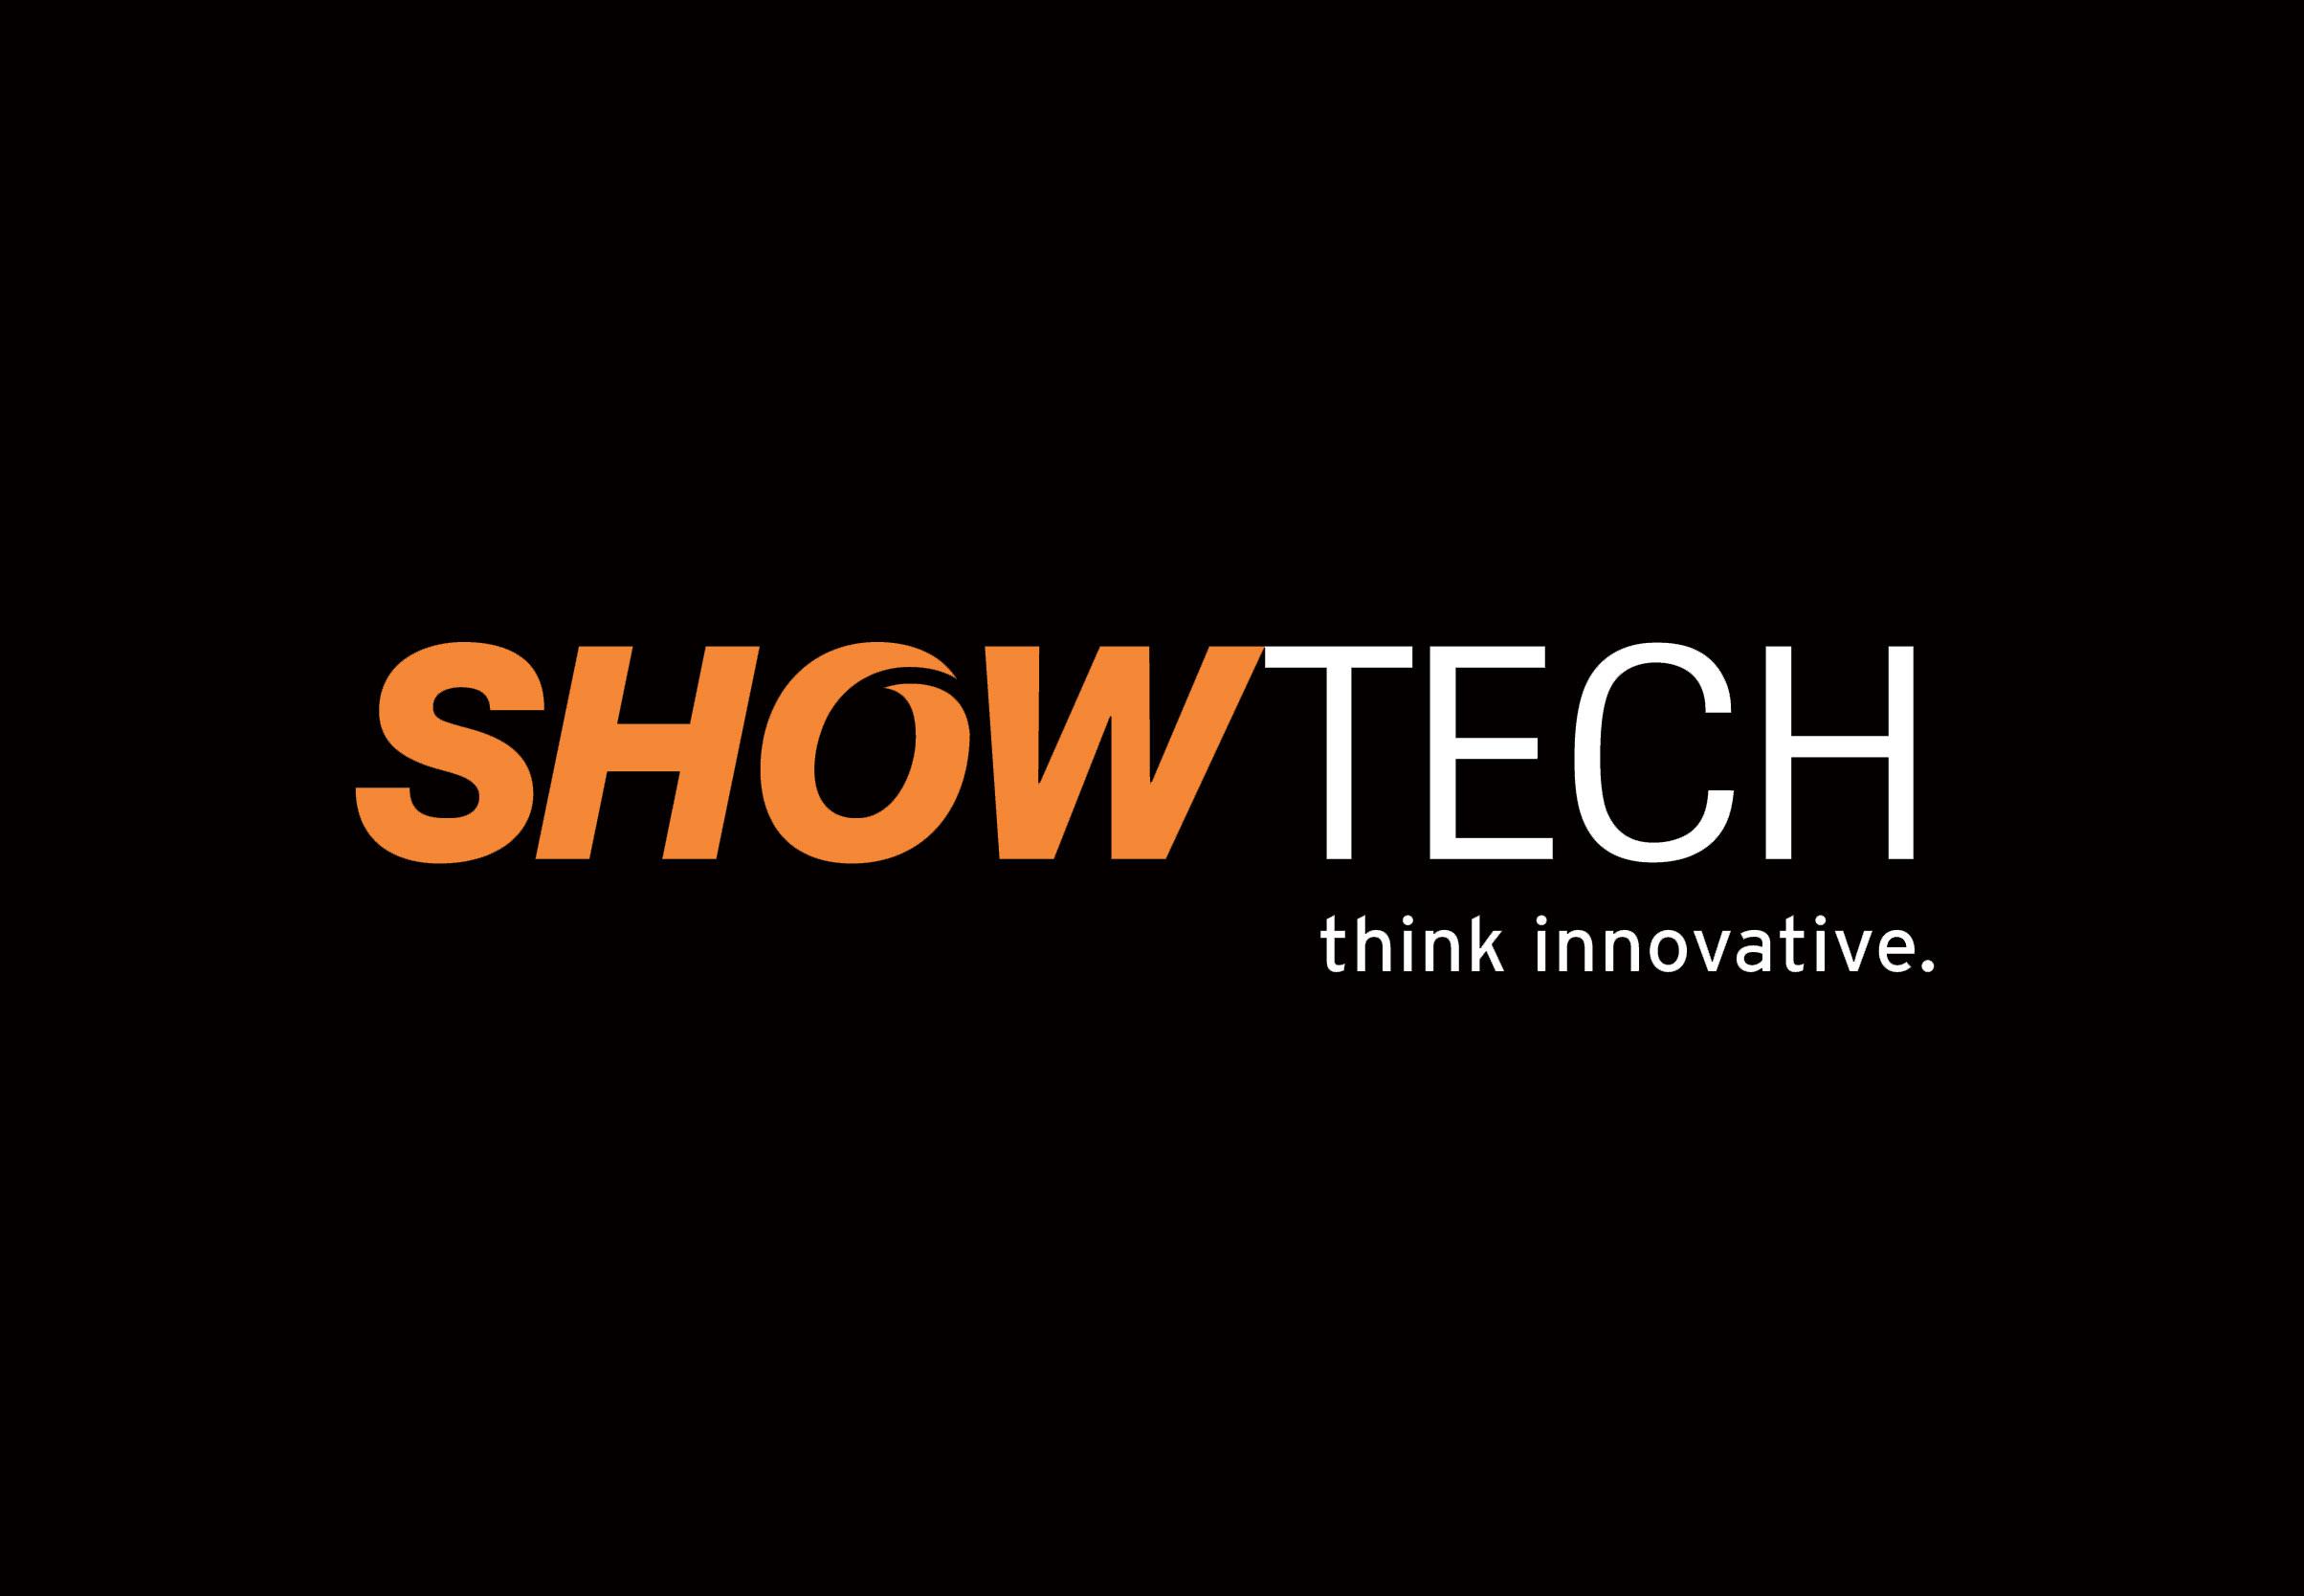 Logo der Showtech GmbH